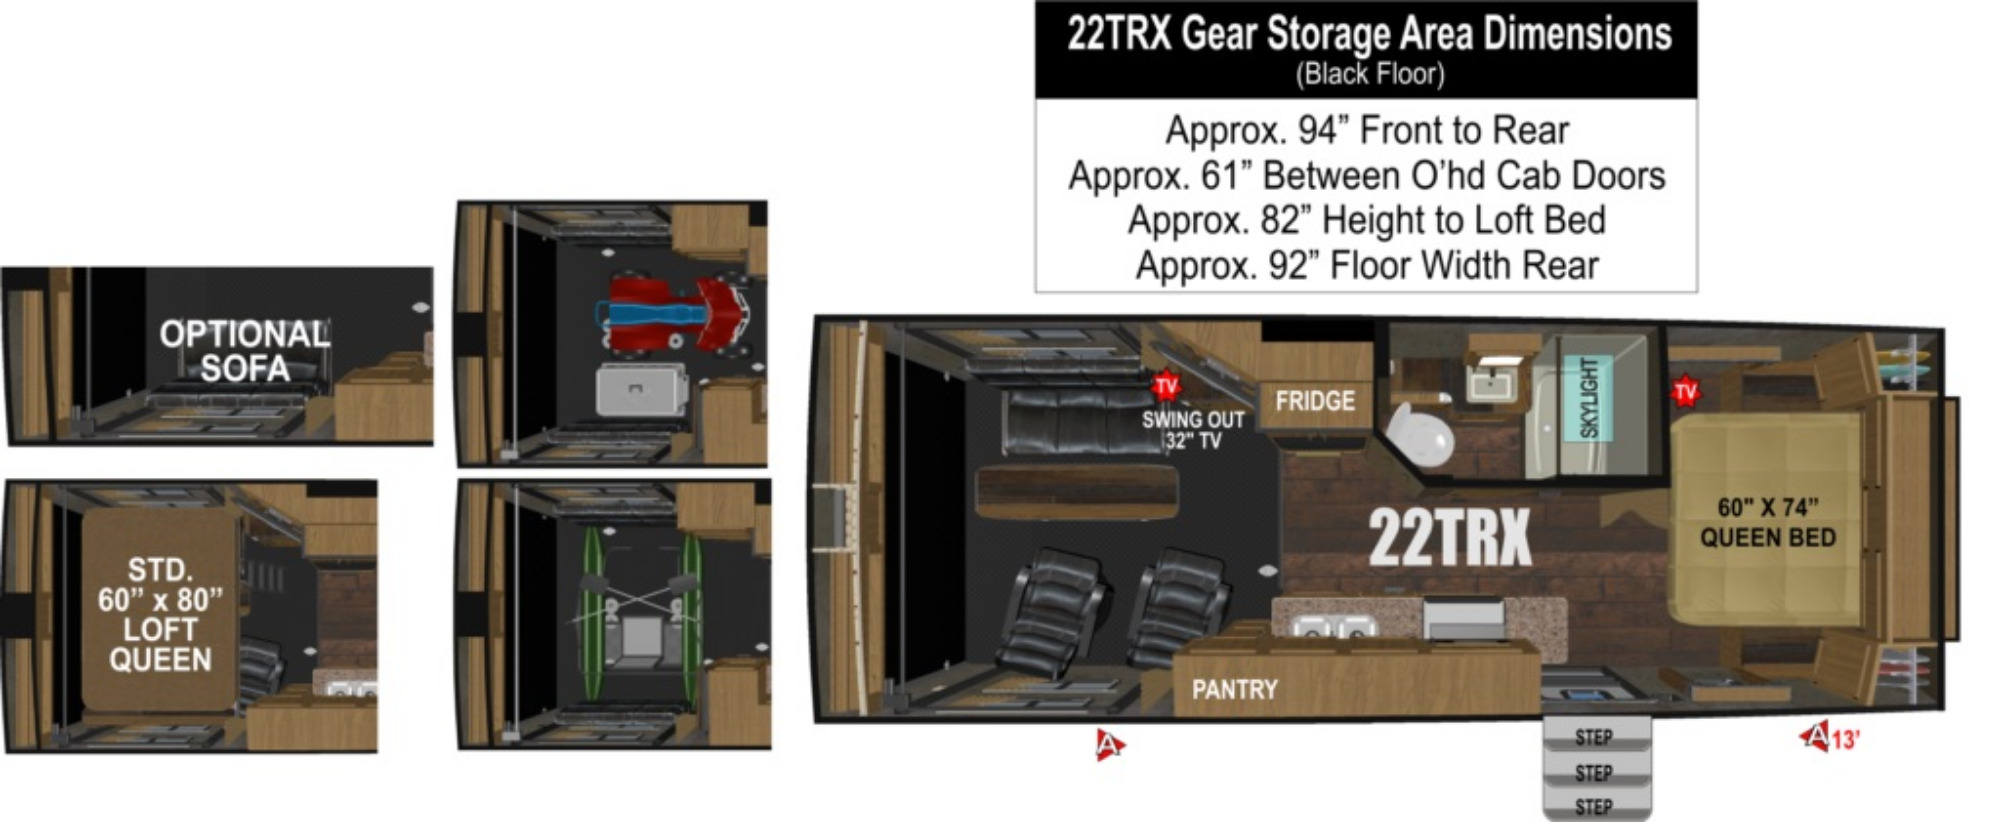 Garage : 2019-OUTDOORS RV-22TRX